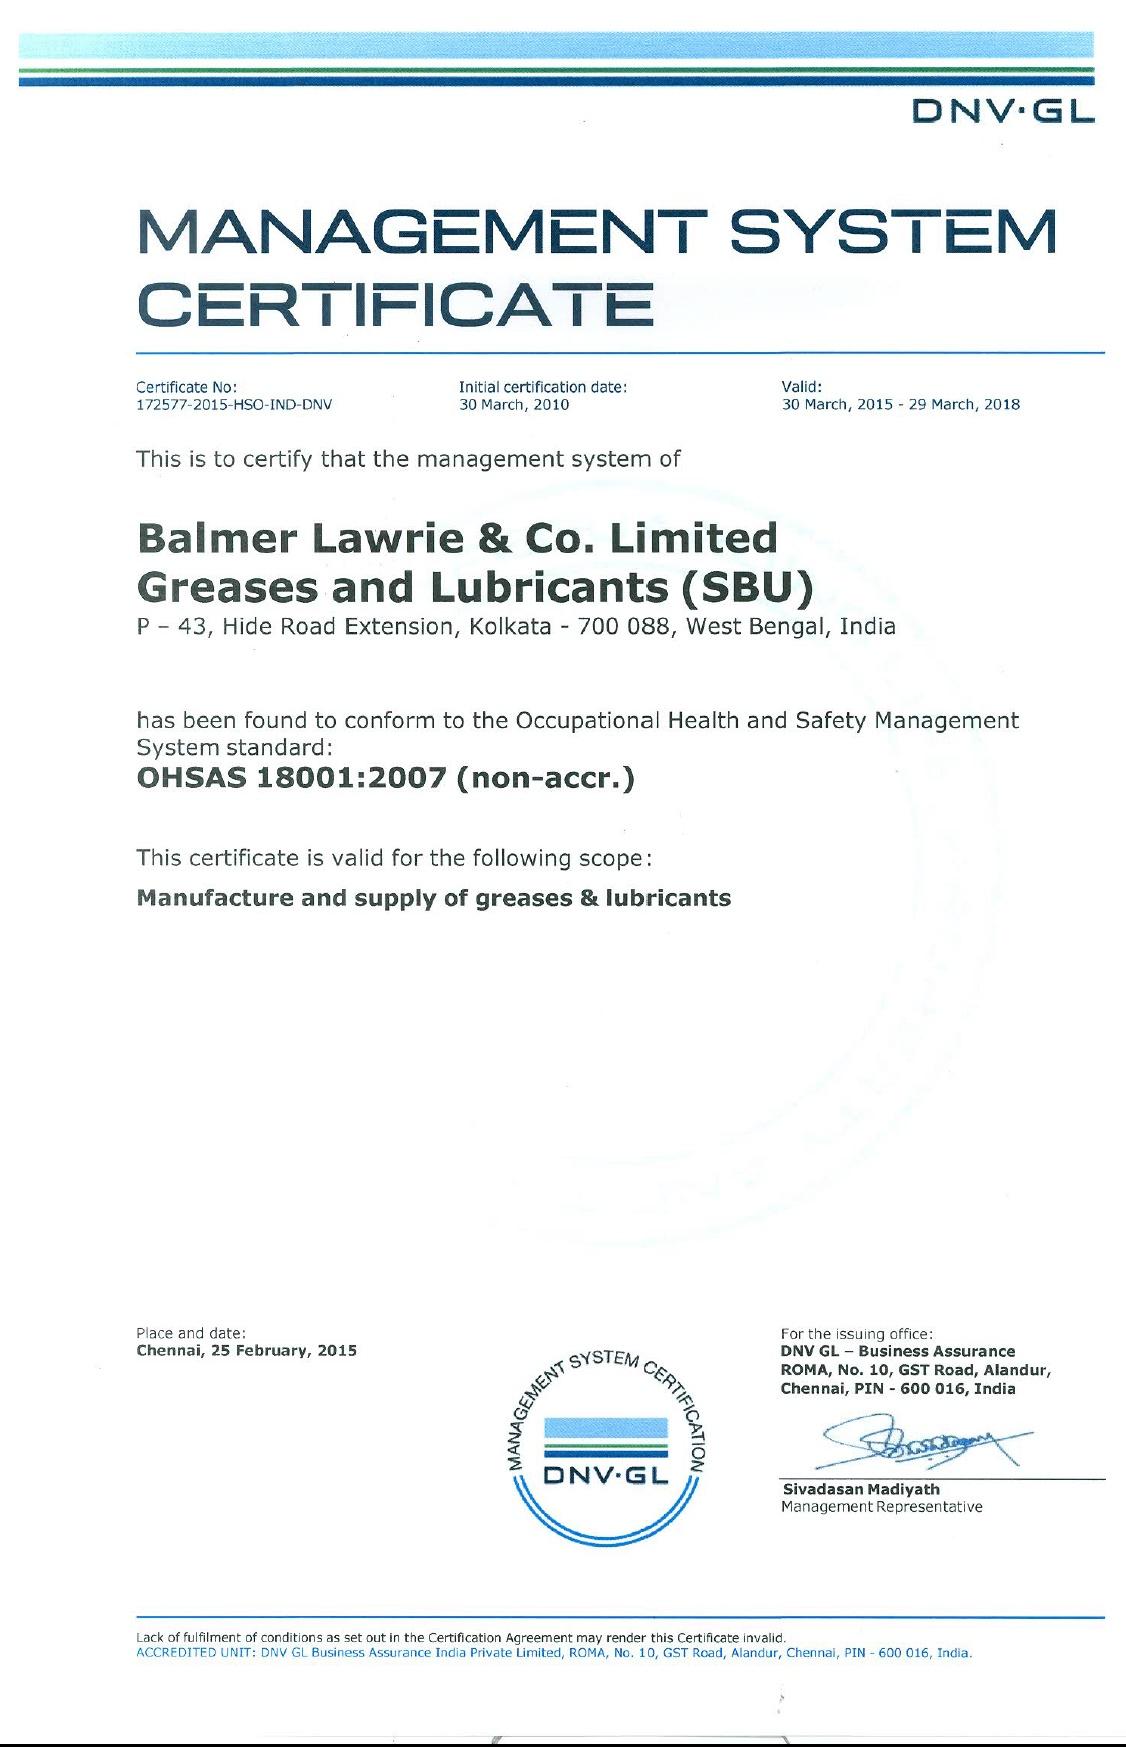 OHSAS certification 18001:2007